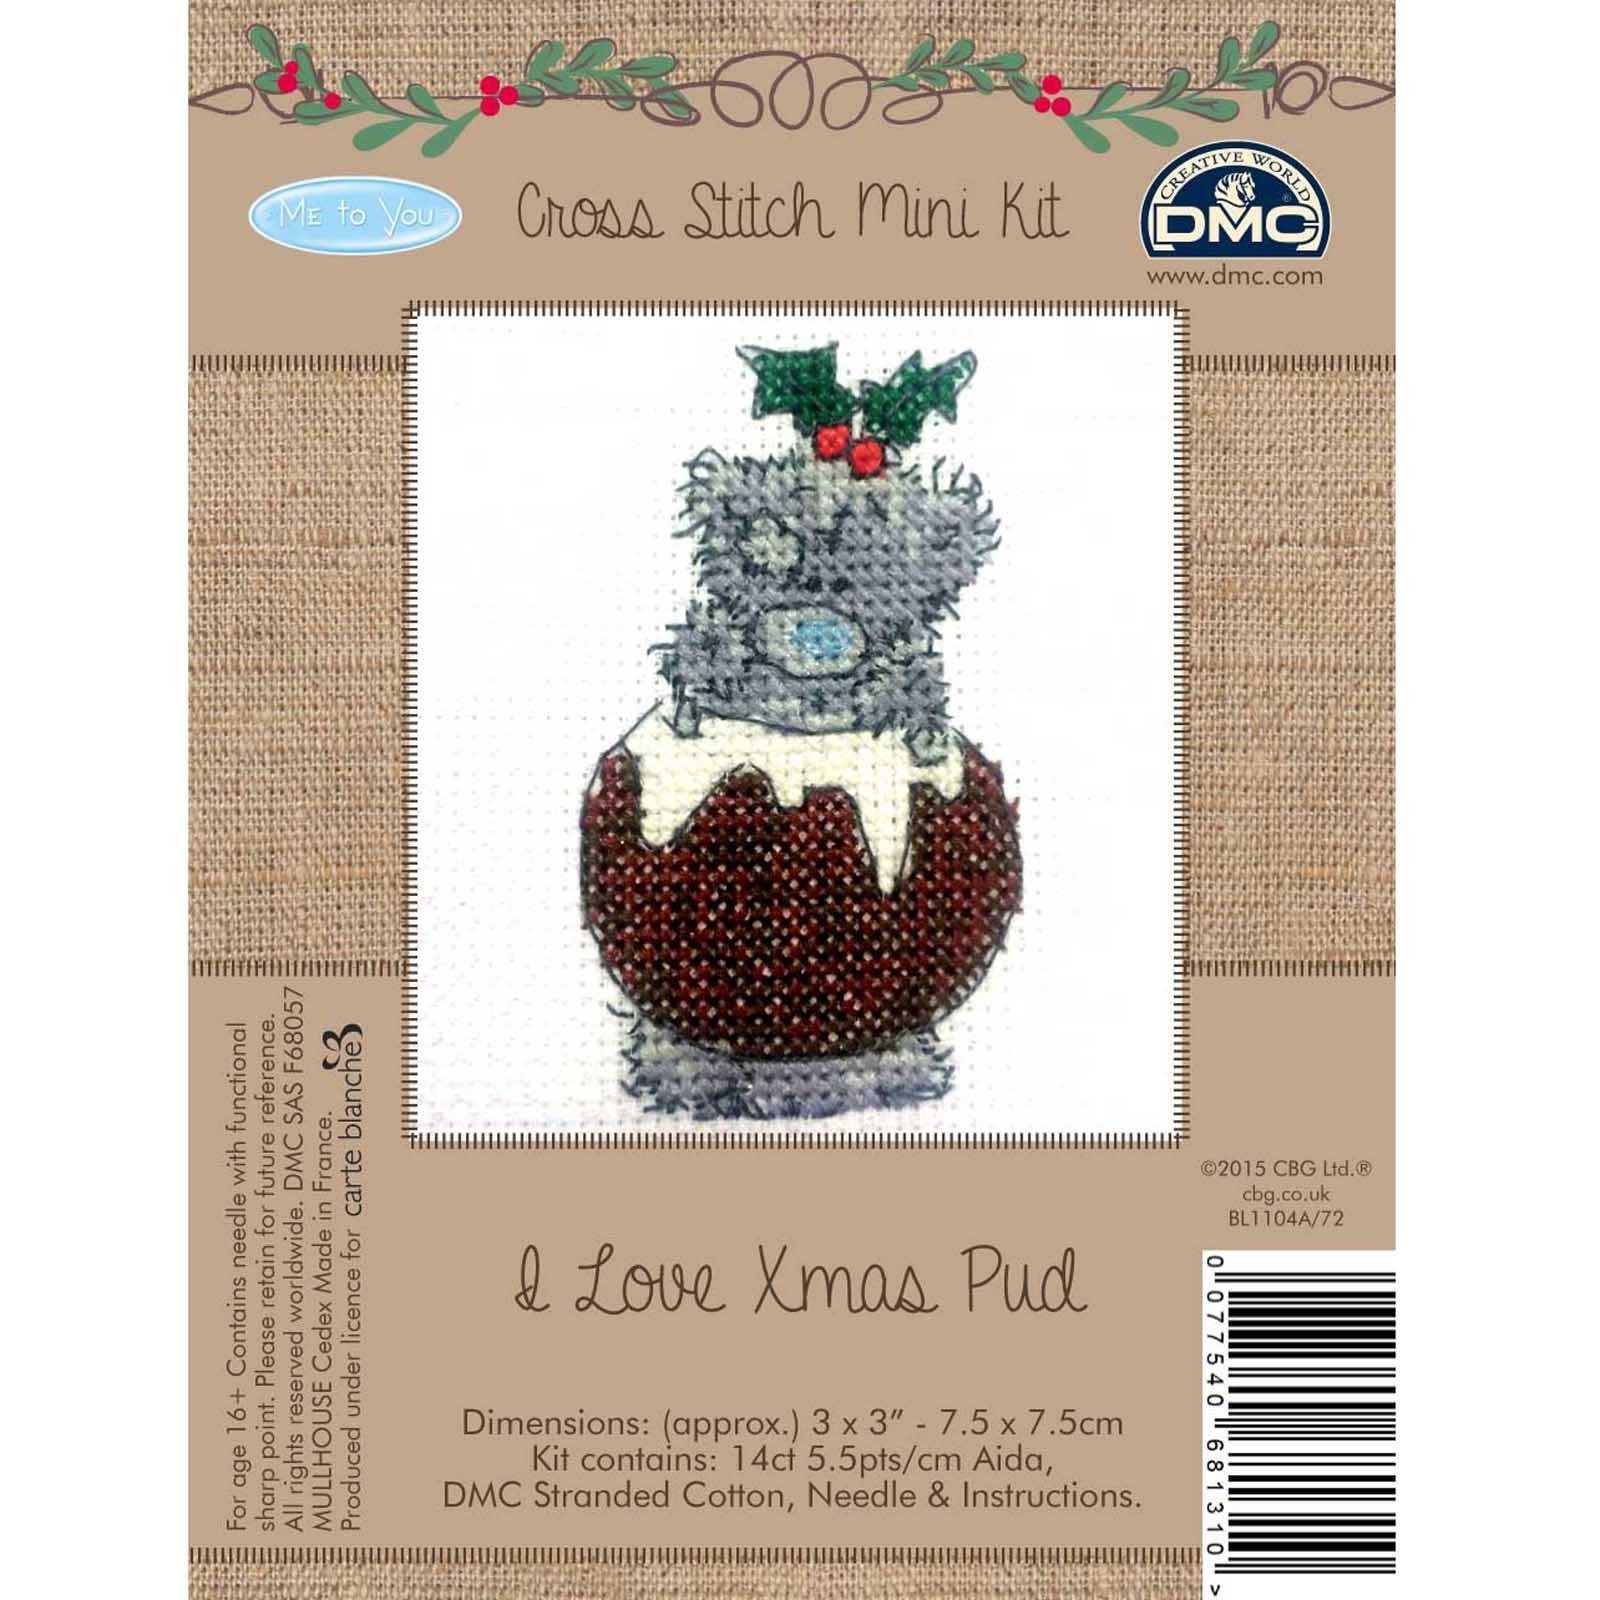 DMC-Me-to-You-Tatty-Teddy-Christmas-Mini-Cross-Stitch-Kits-8-Designs thumbnail 11